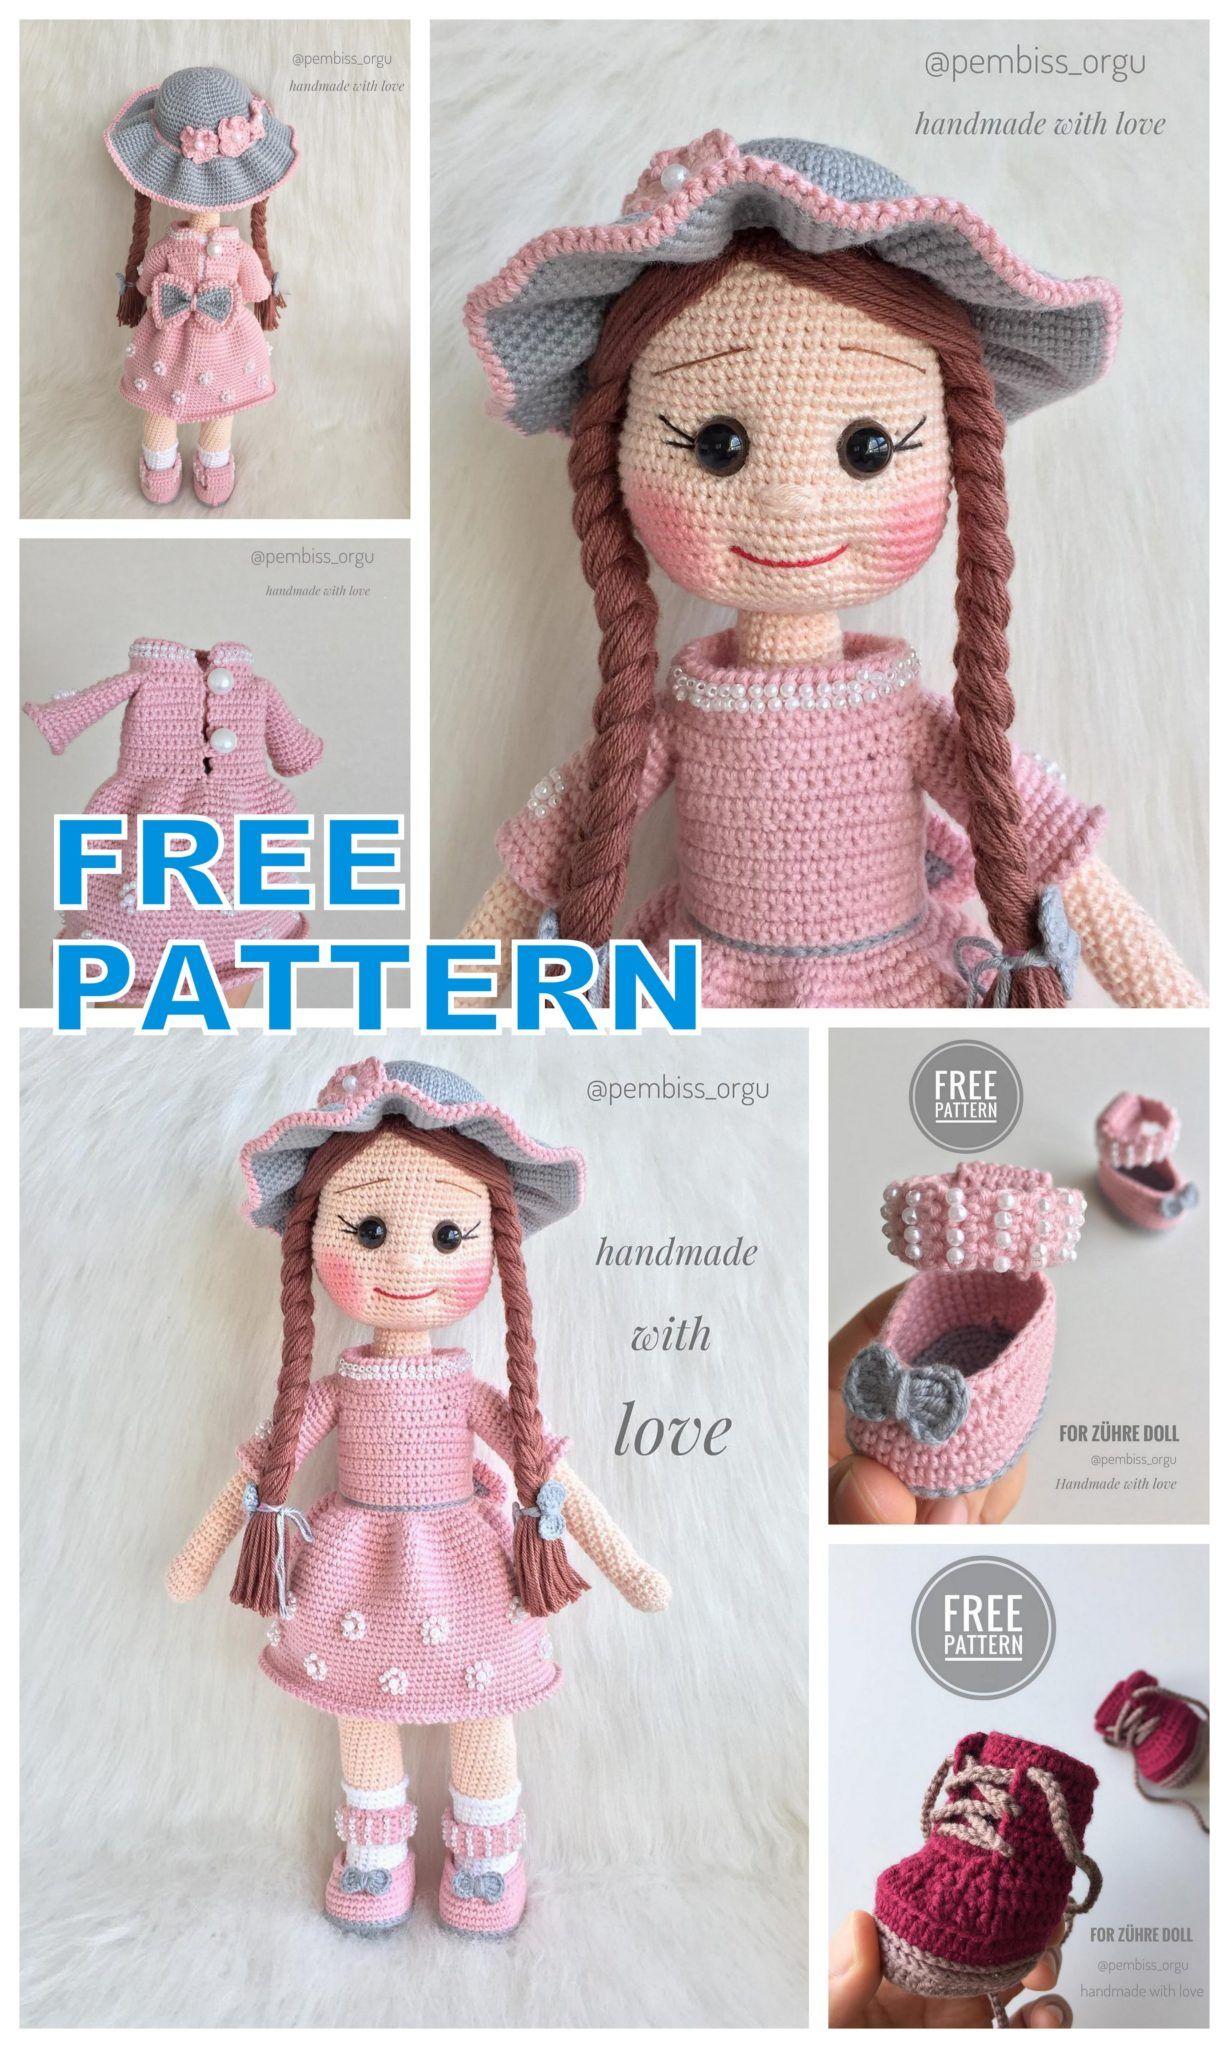 Beautiful Lady Crochet Elephant - Pattern Center | 2048x1229